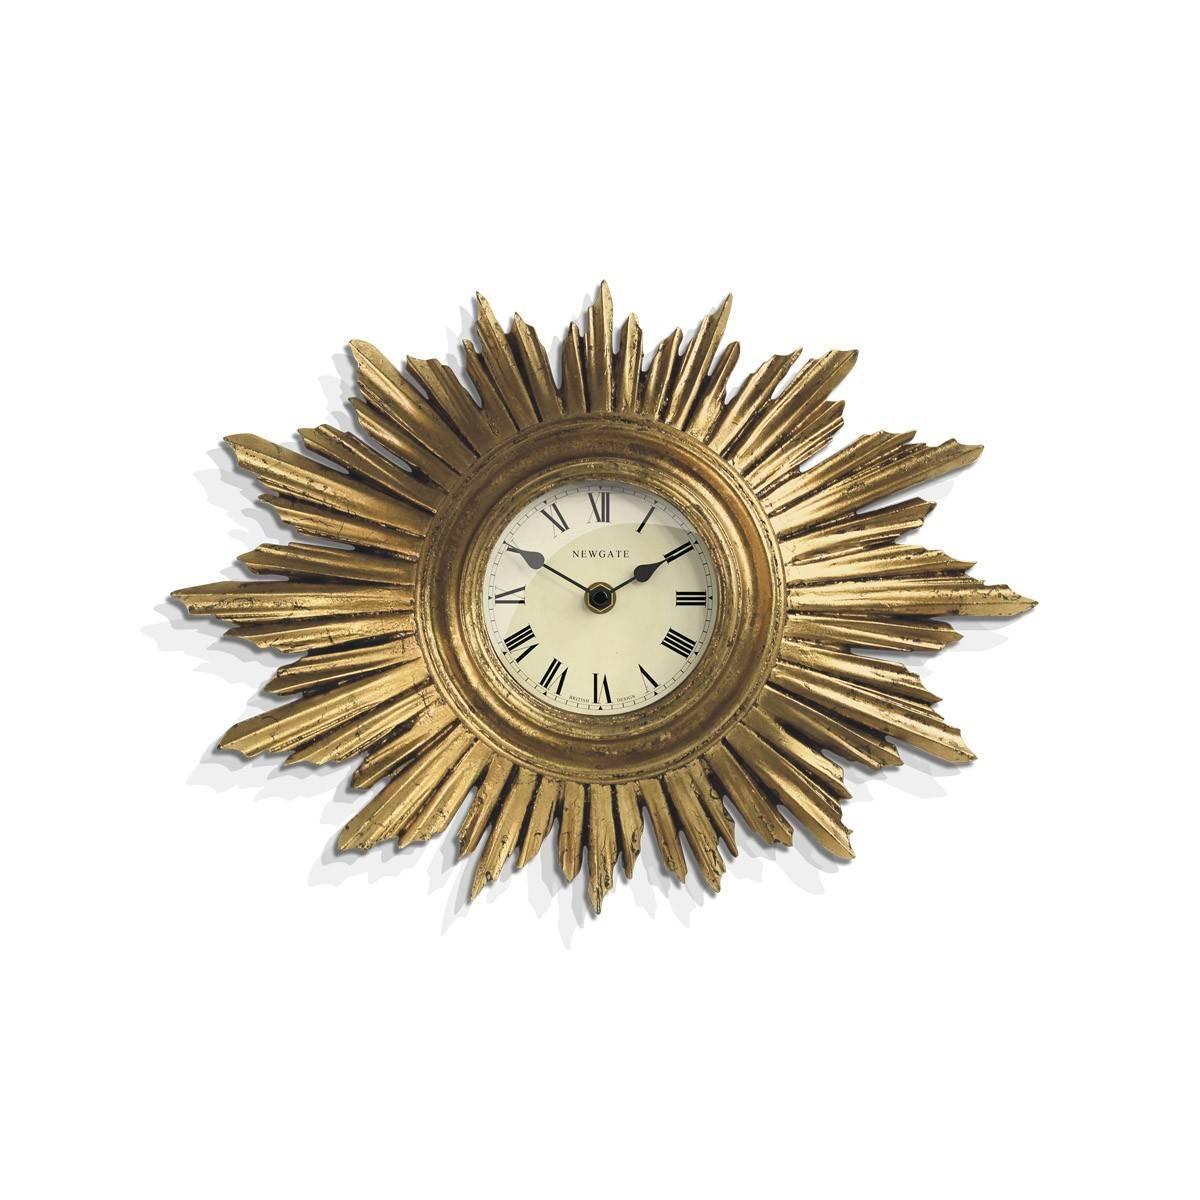 Gold Sunburst Art Deco Wall Clock | Newgate Clocks | Sunburst With Most Up To Date Art Deco Wall Clocks (Gallery 18 of 25)